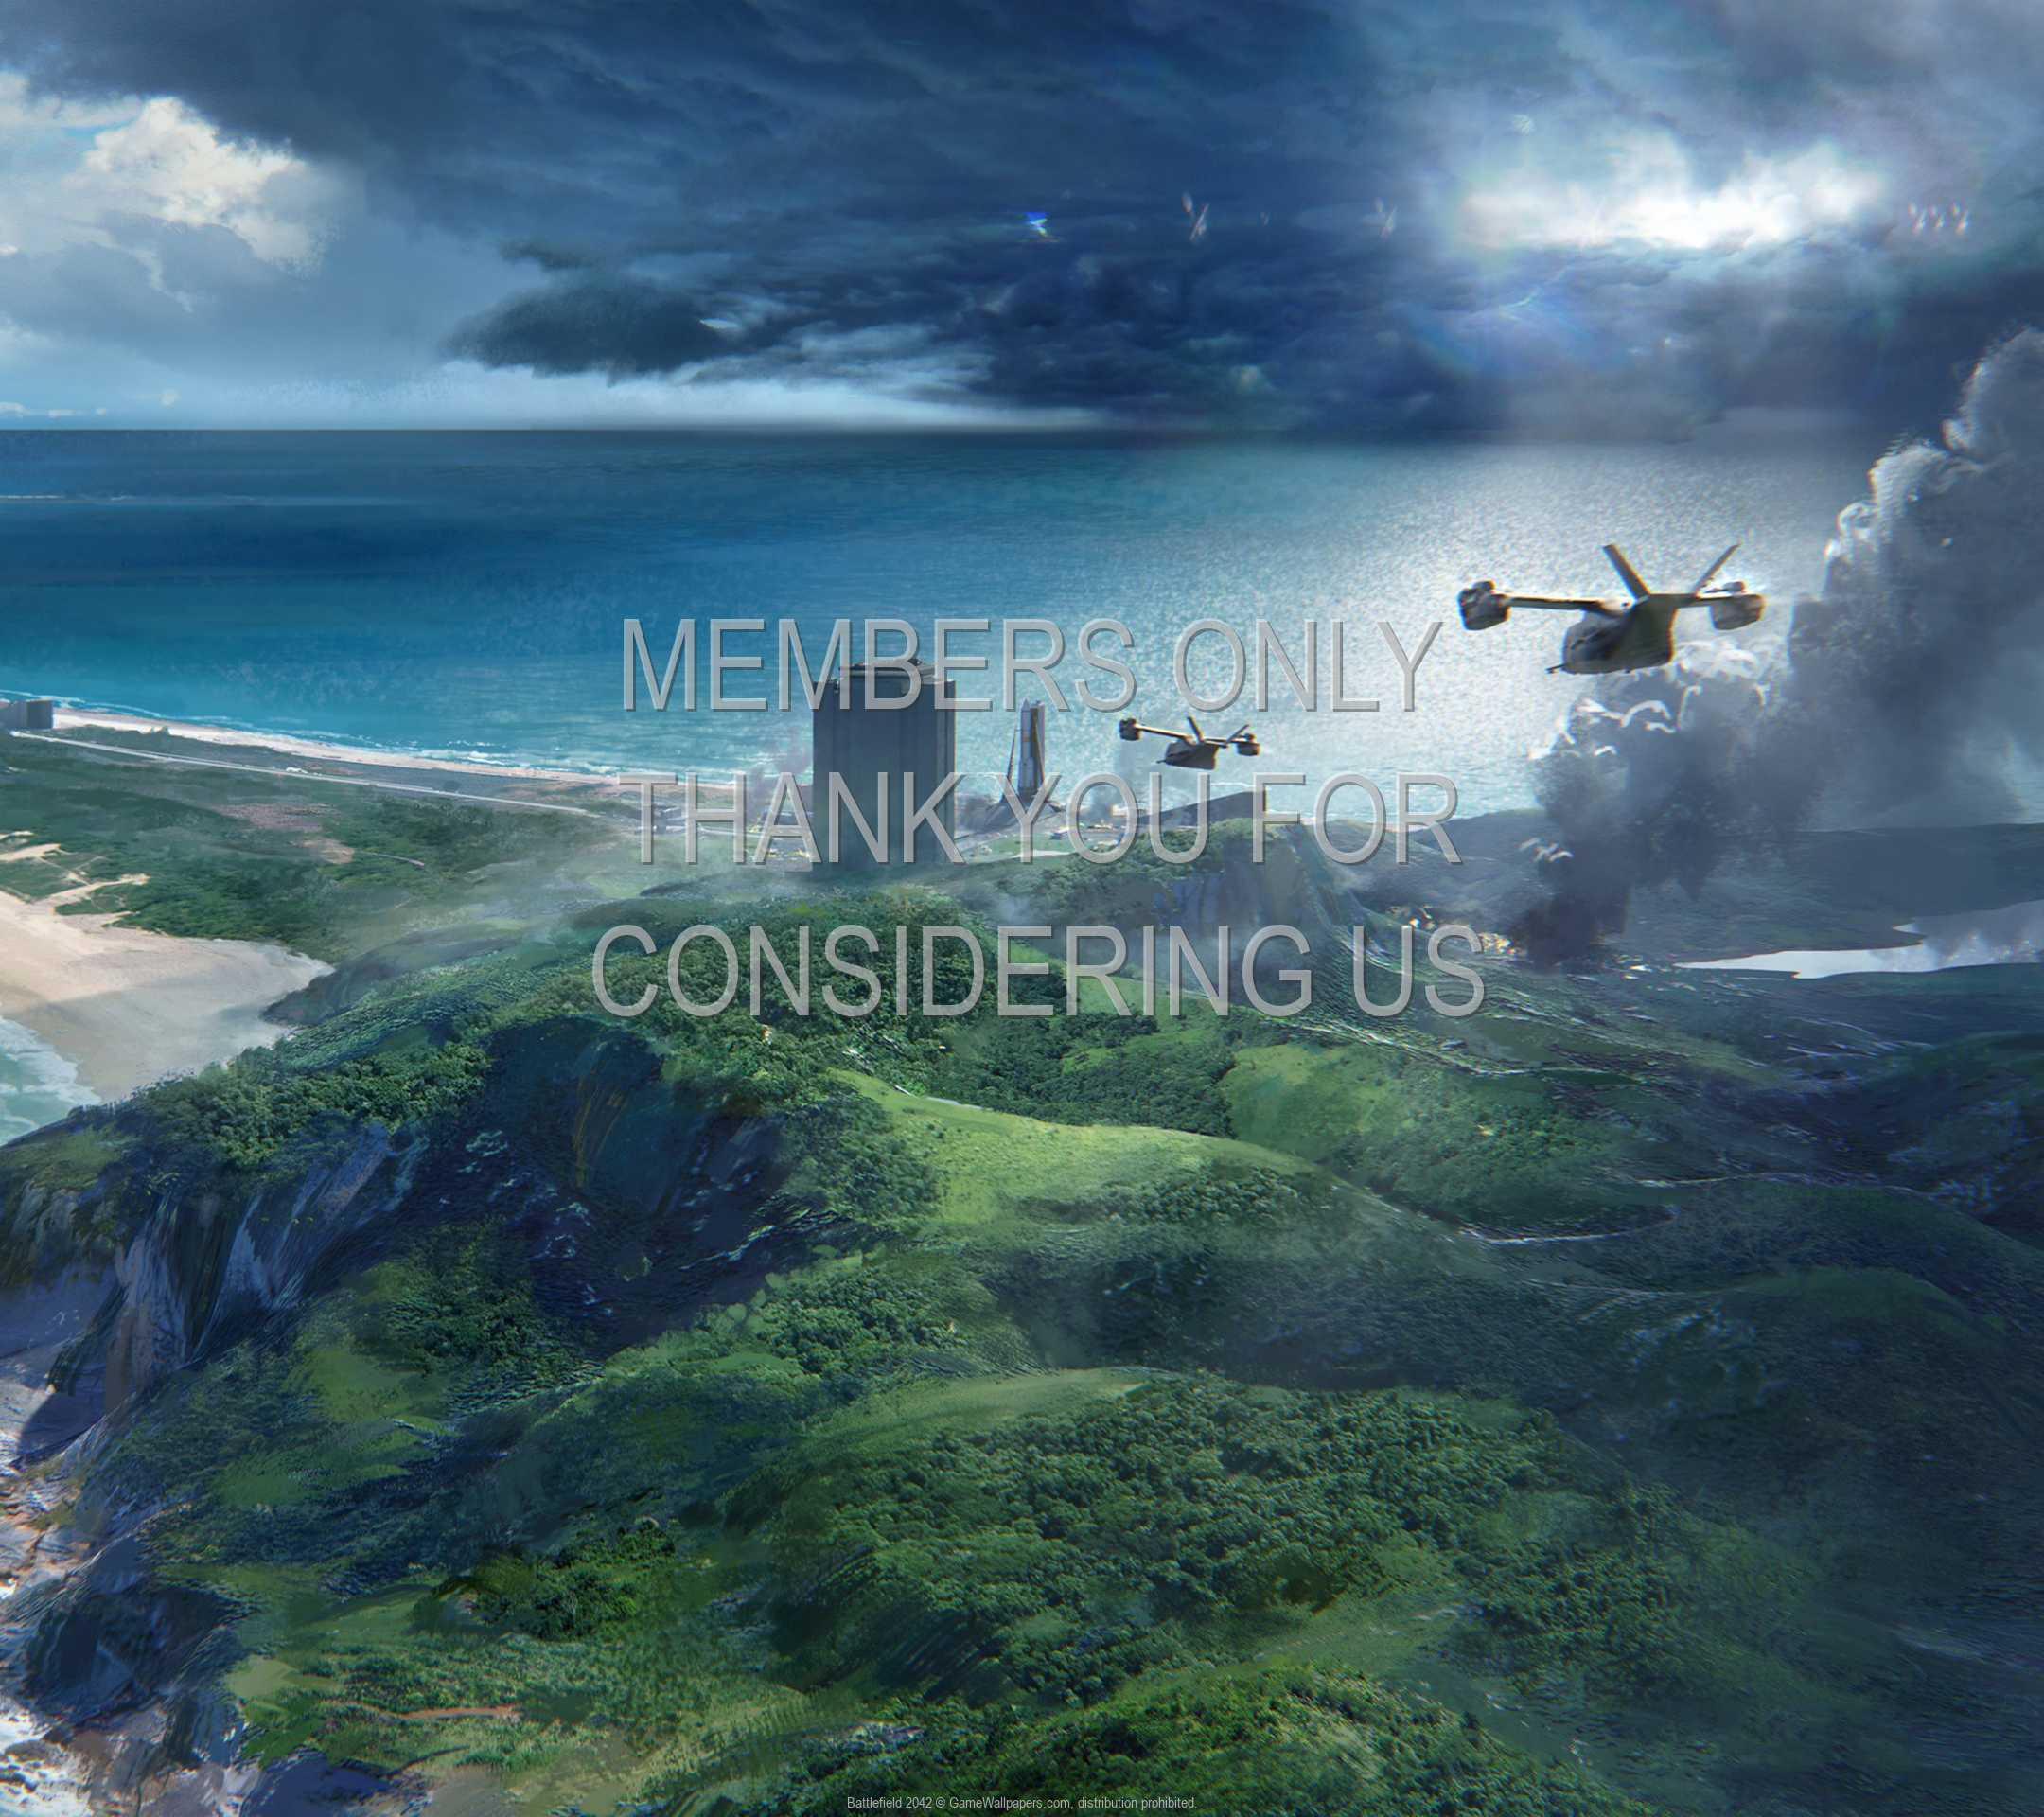 Battlefield 2042 1080p Horizontal Mobile wallpaper or background 03